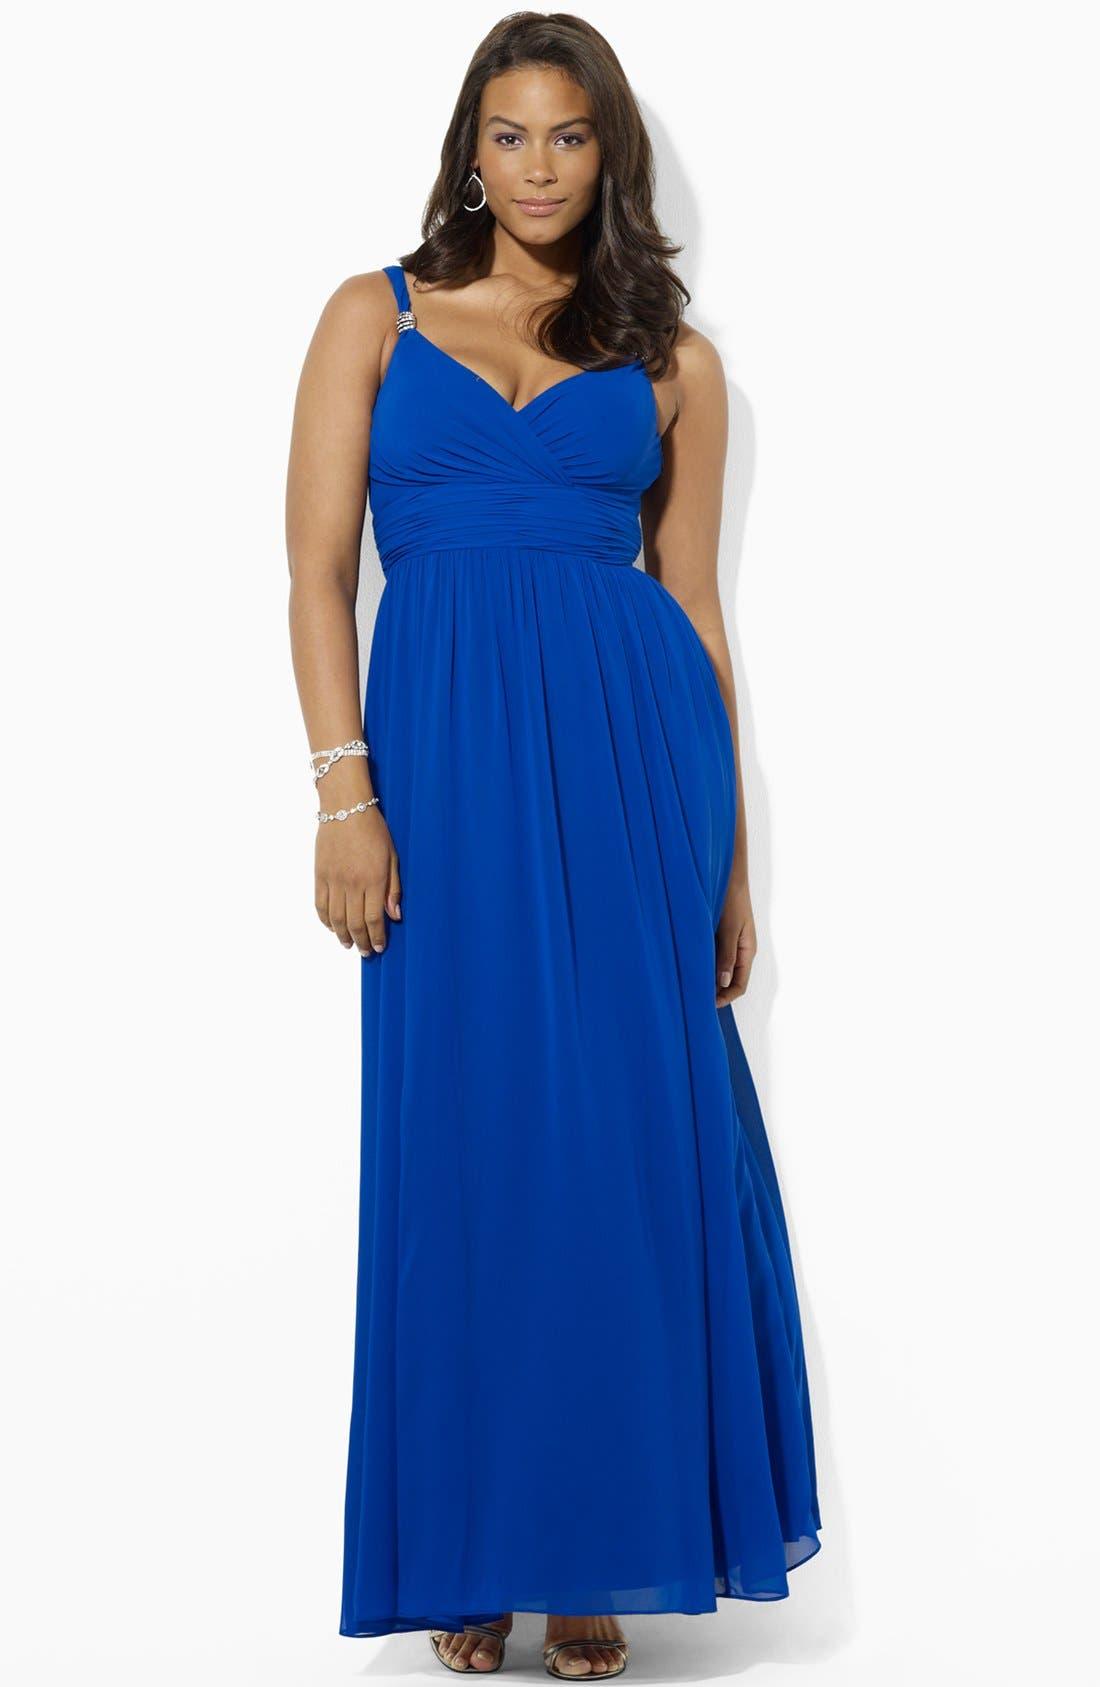 Alternate Image 1 Selected - Lauren Ralph Lauren Embellished Surplice Chiffon Gown (Plus Size)